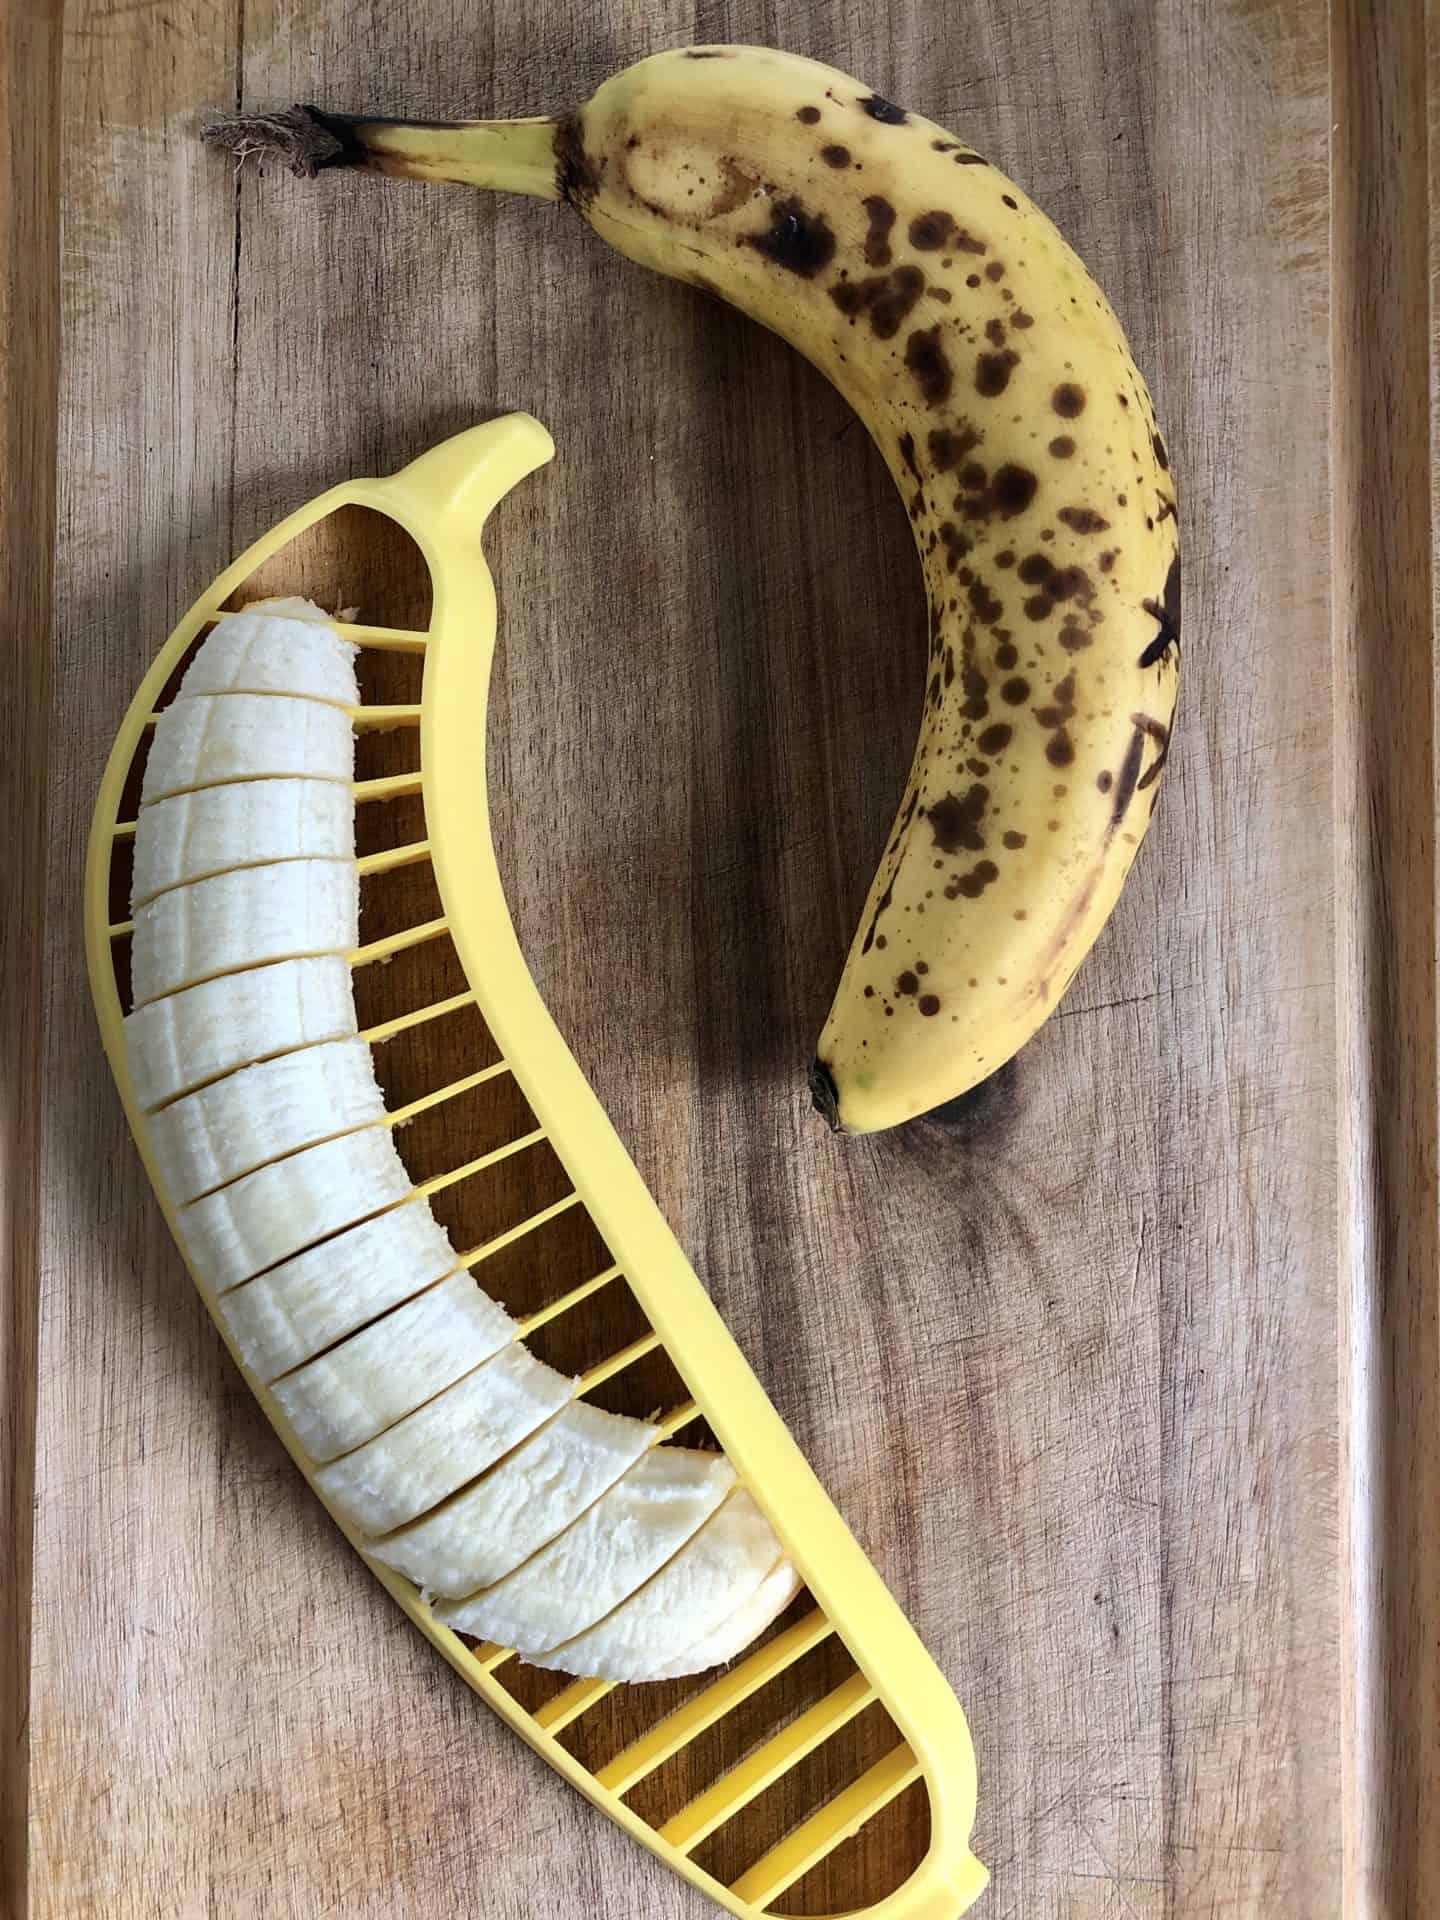 Bananas being sliced with a banana slicer